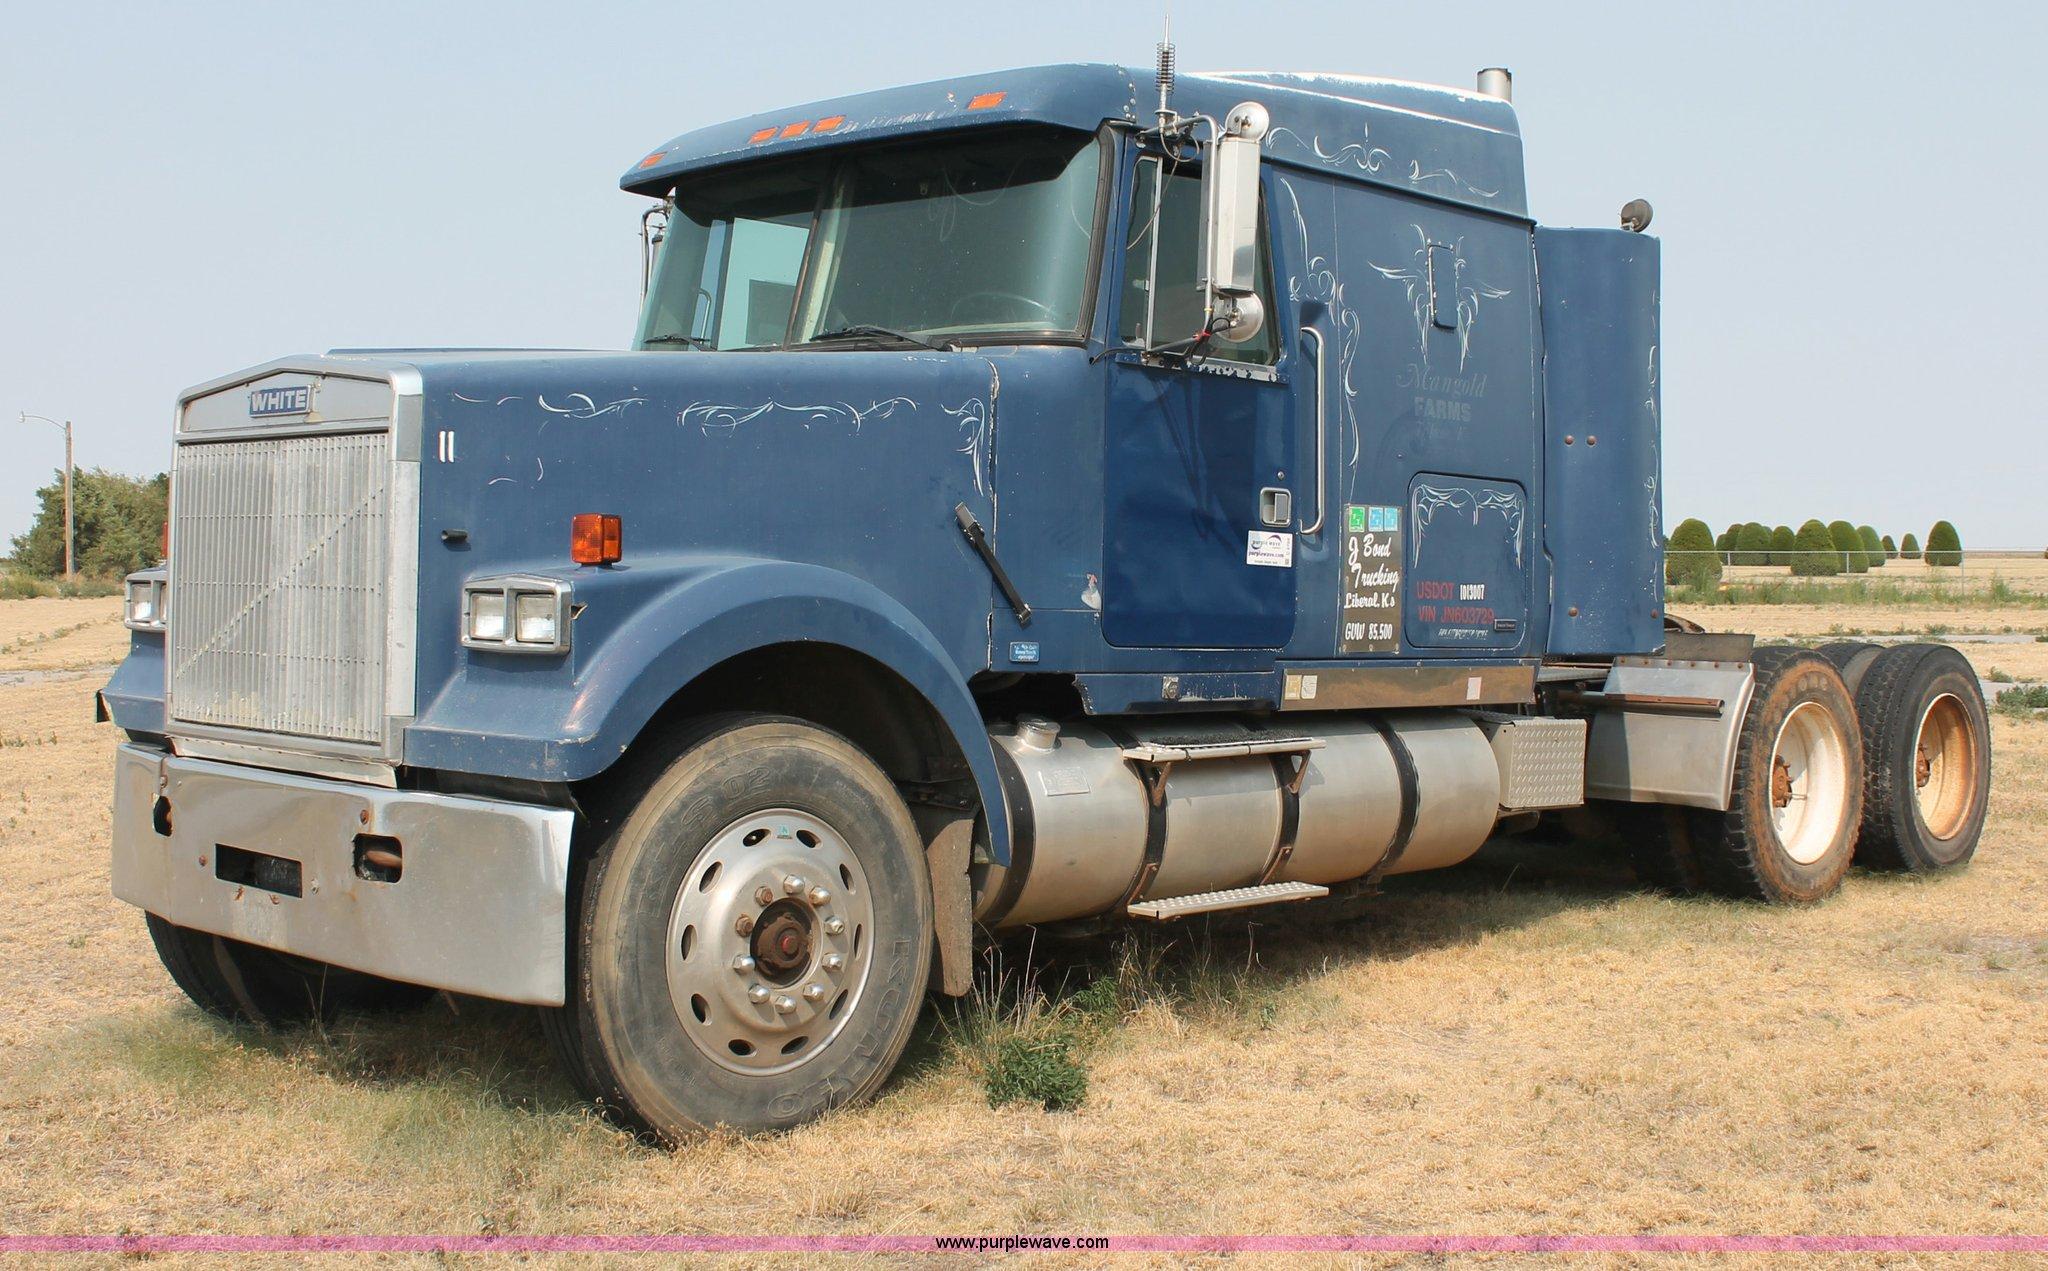 semi sells s fleet free truck sale ford parts duty f heavy for volvo shipping used series sales com trucks badge medium